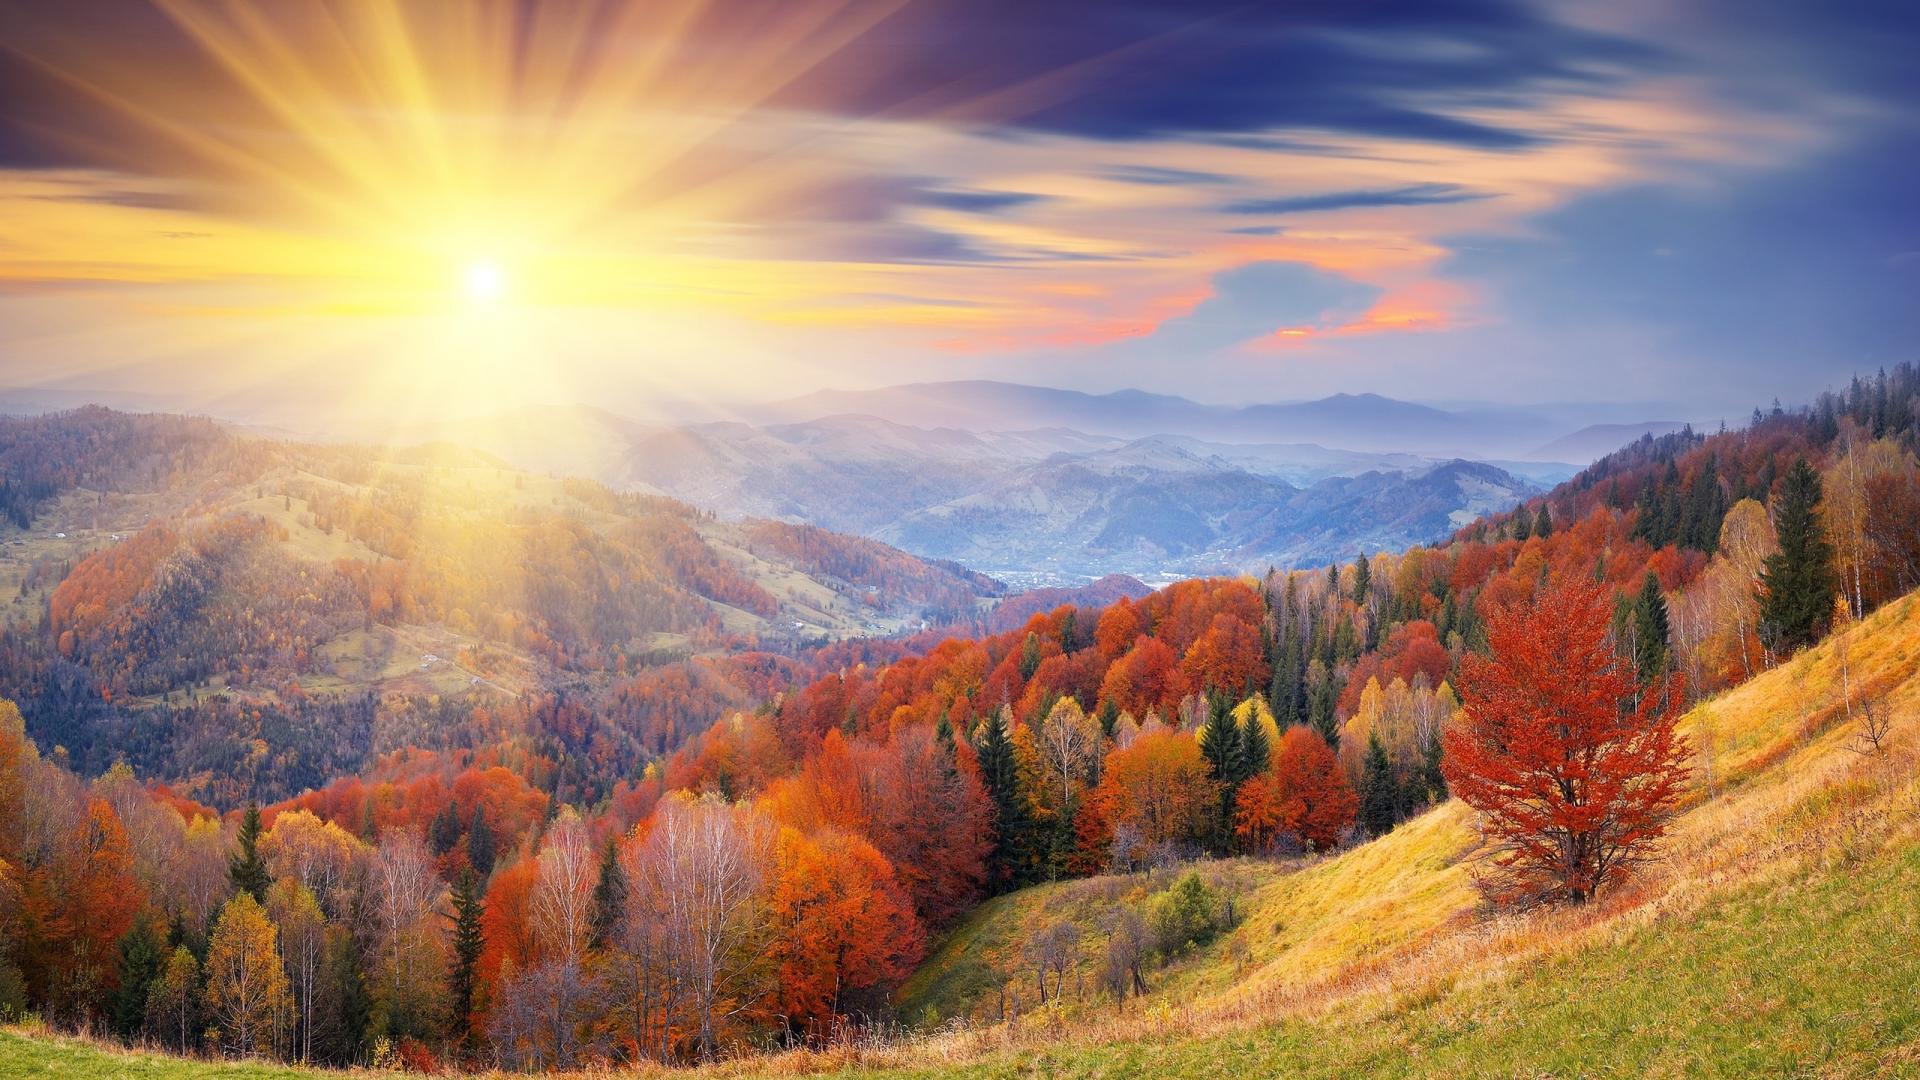 Hd Beautiful Nature Wallpapers Desktop Backgrounds Free Download